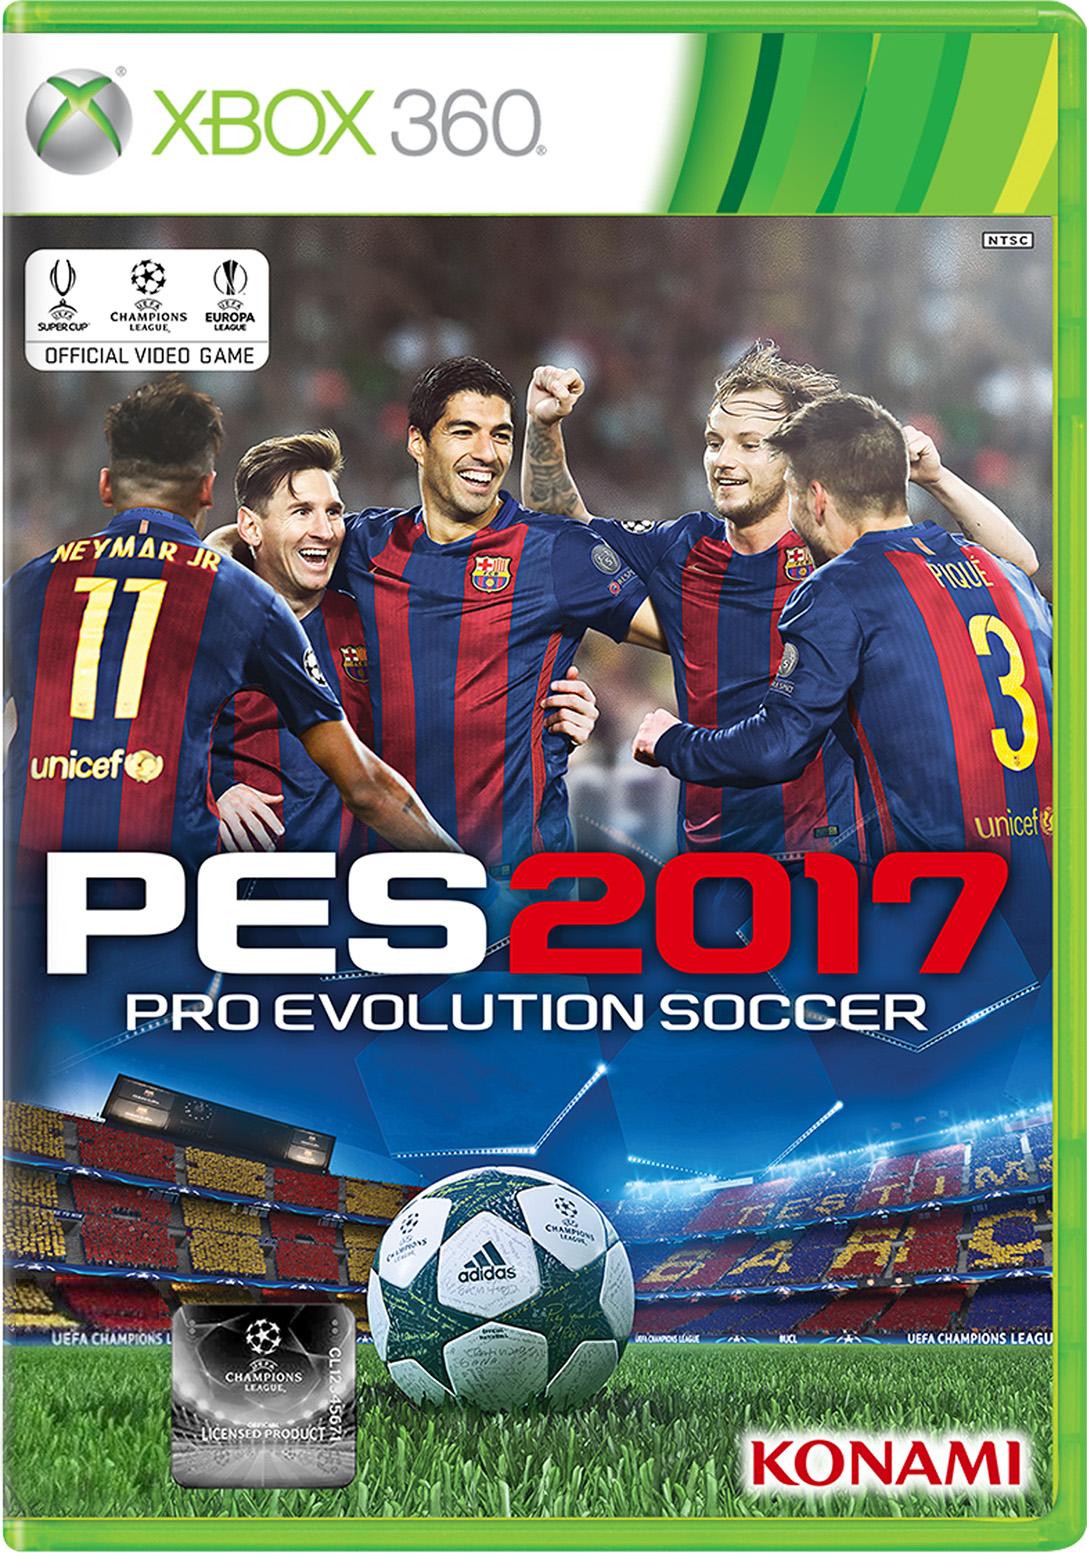 Pro Evolution Soccer 2017 for Xbox 360